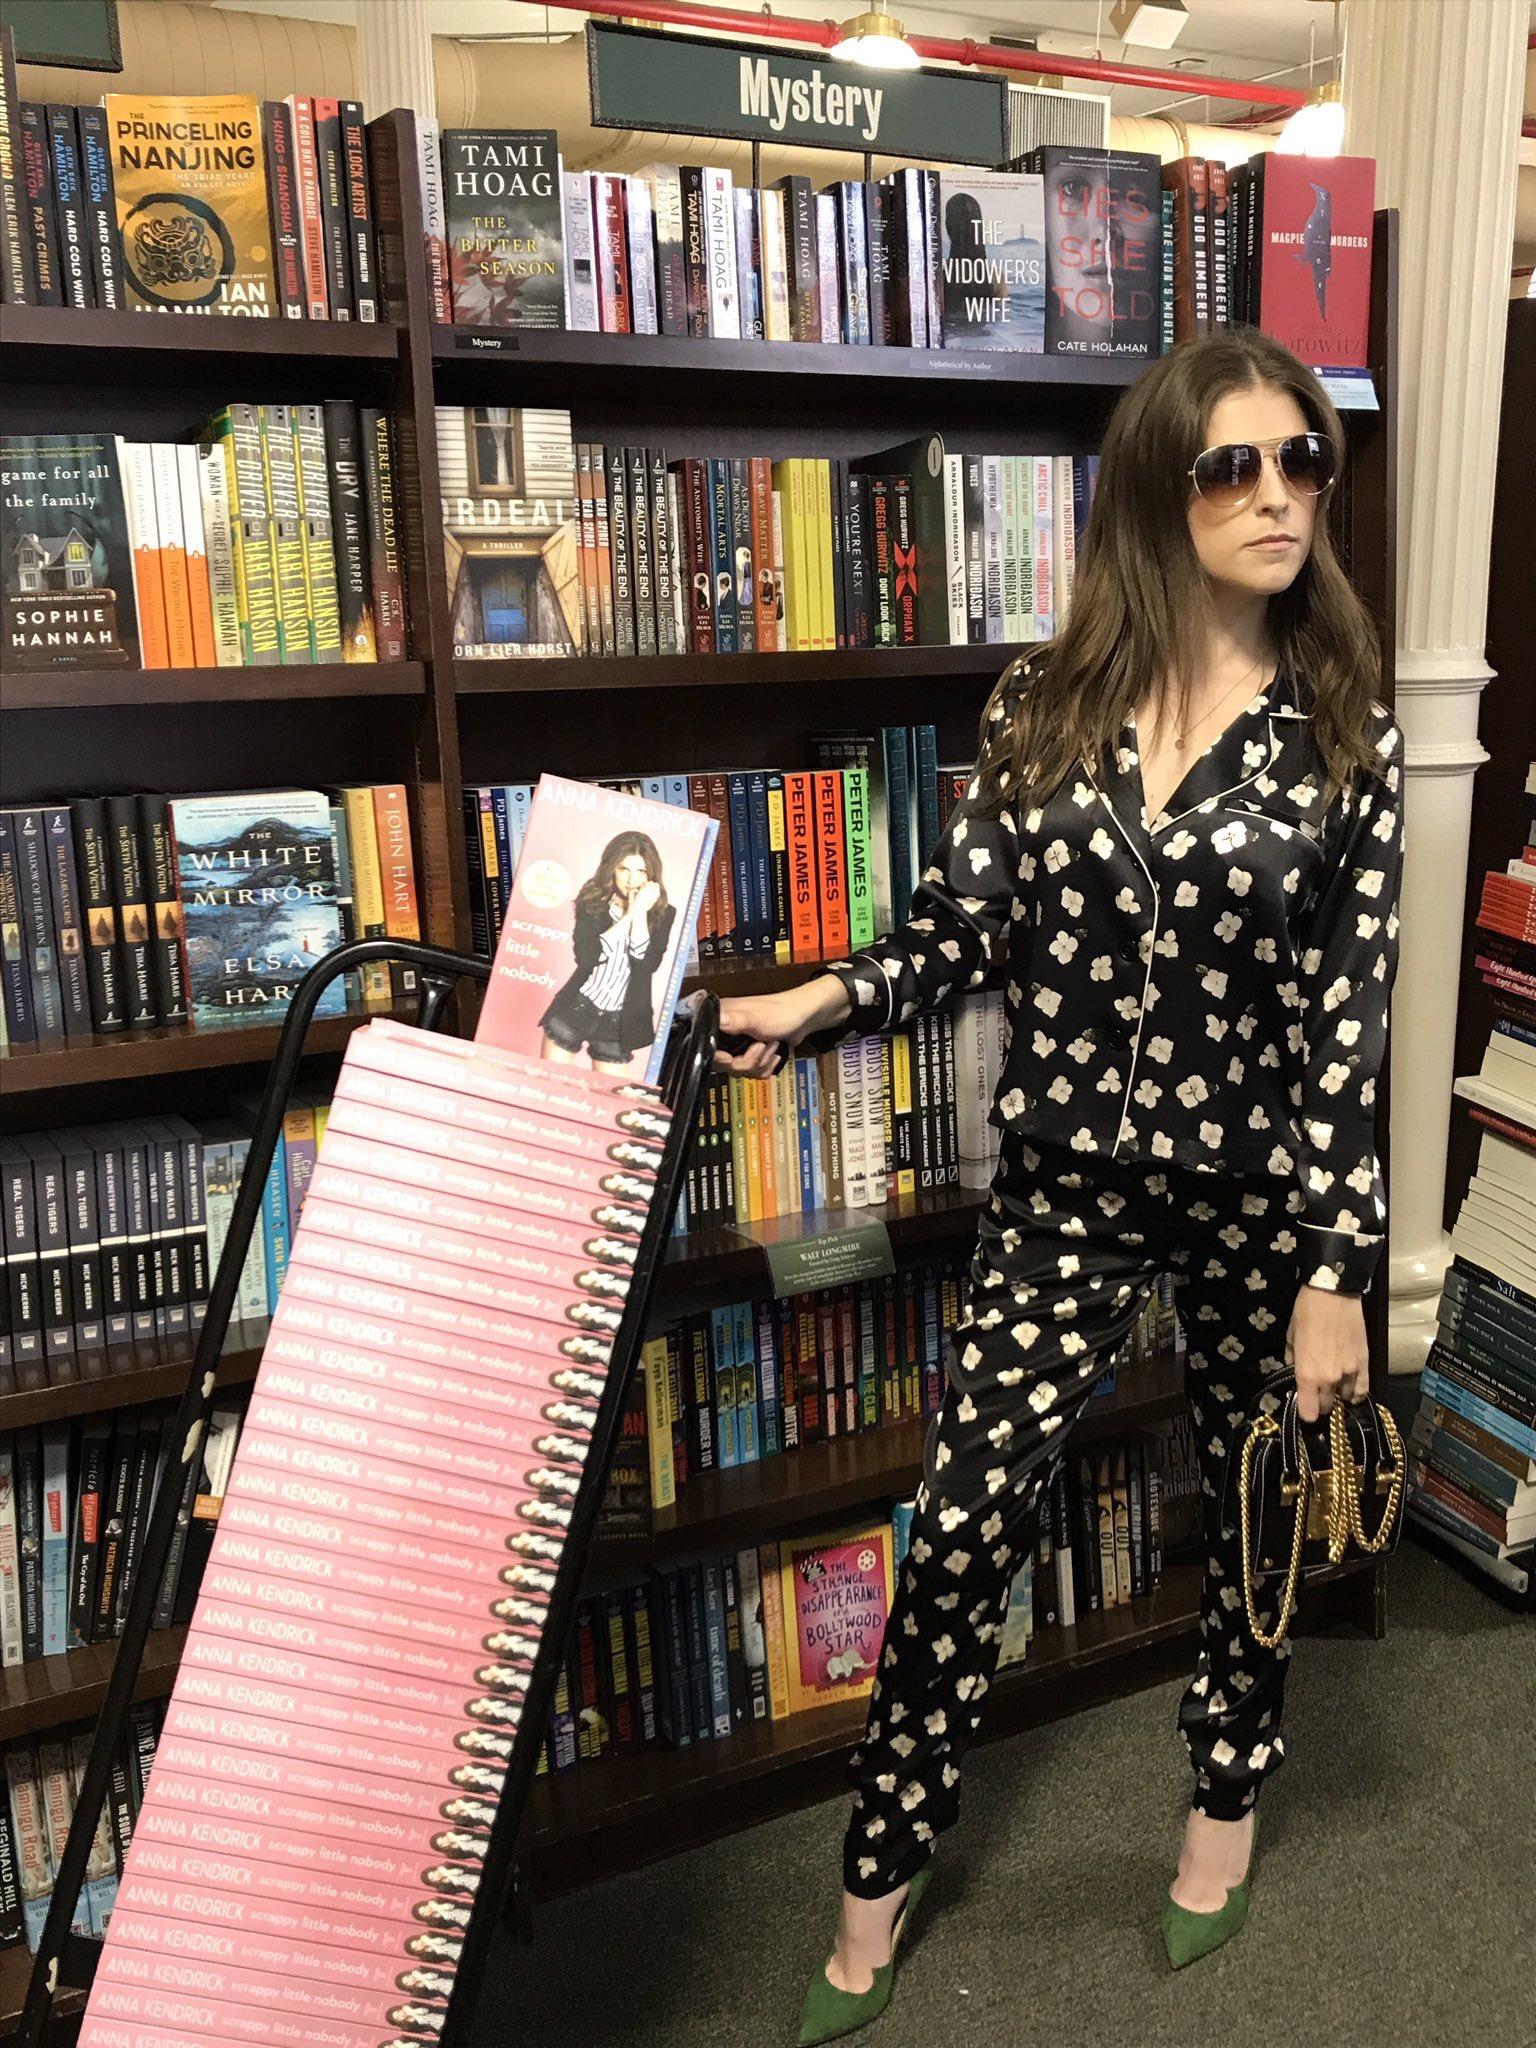 Just wheeling a few extra paperbacks into Union Square #ScrappyLittleNobody #fashionpajamas https://t.co/JKyNCtG8Oy